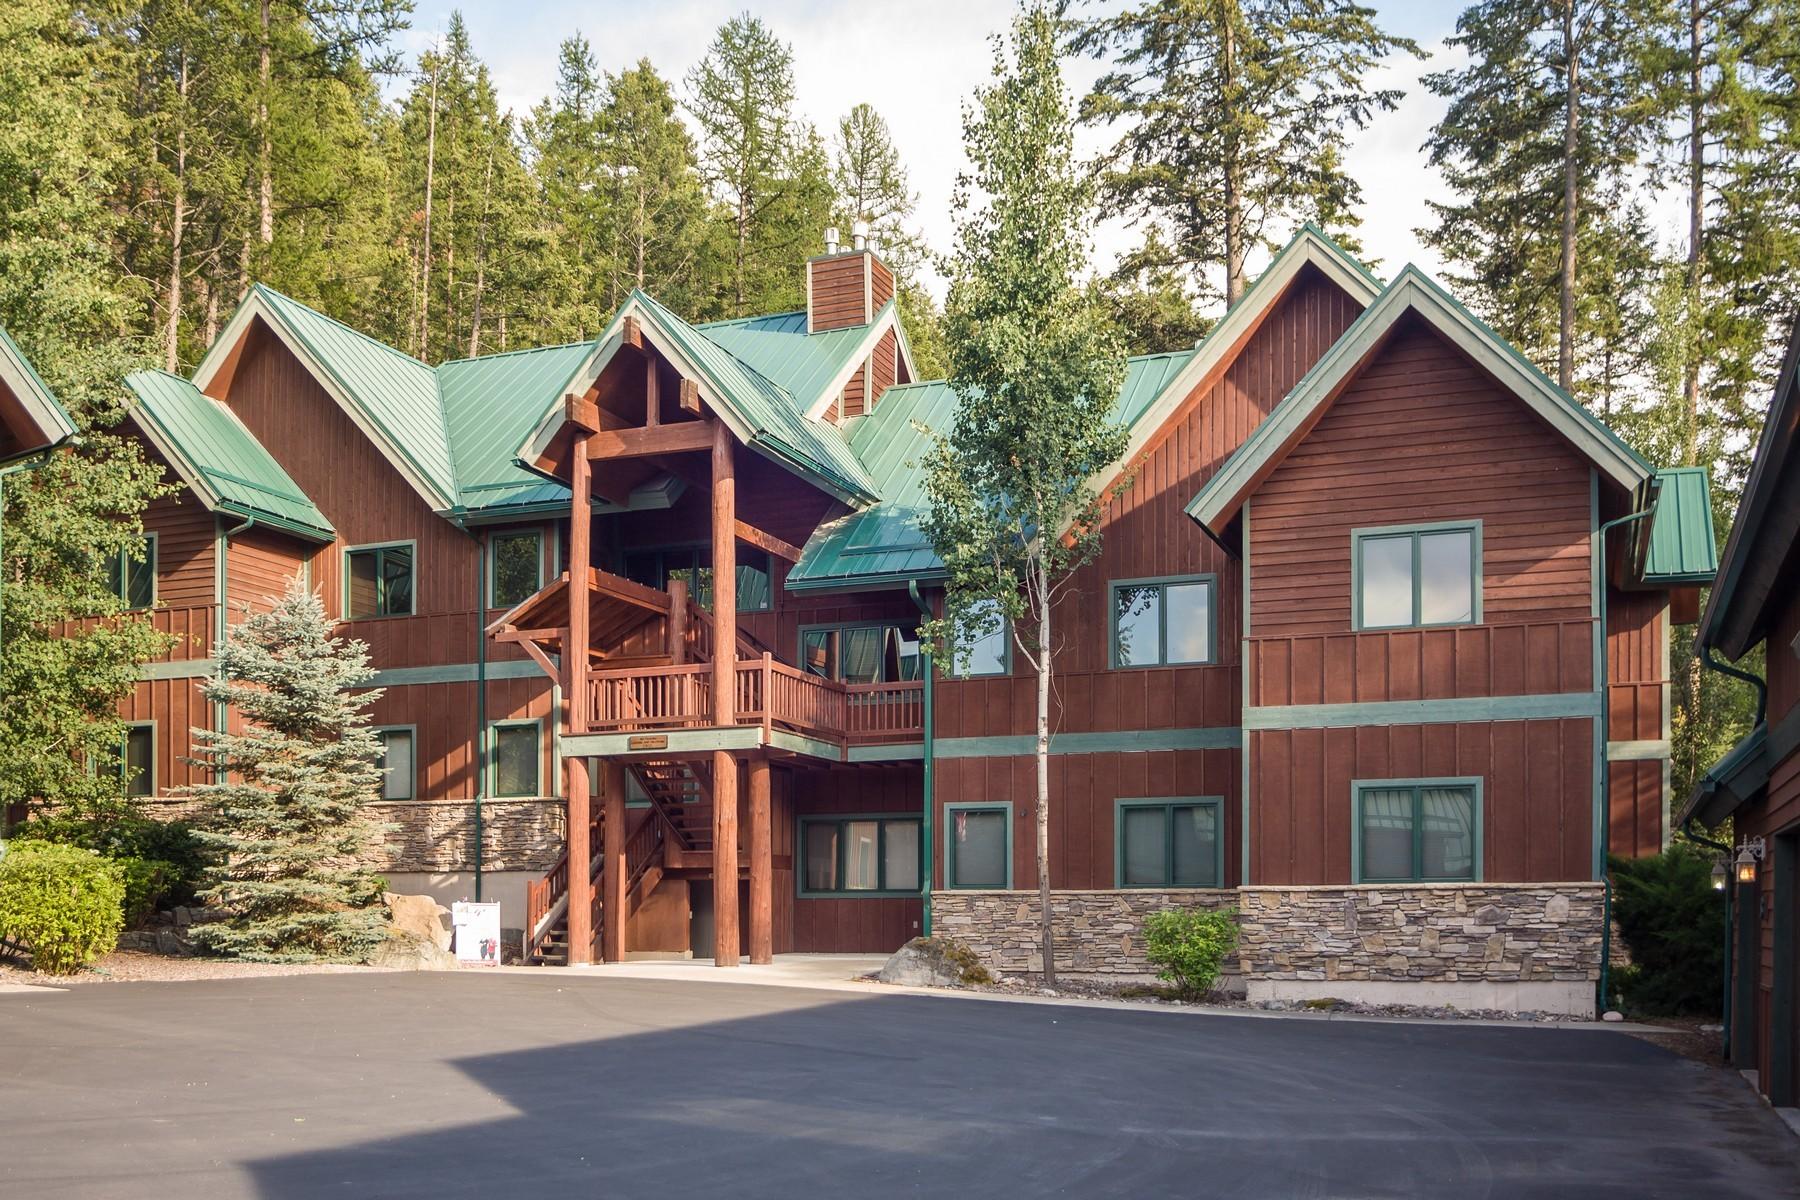 Condomínio para Venda às 185 Bridge St , Bigfork, MT 59911 185 Bridge St Bigfork, Montana, 59911 Estados Unidos